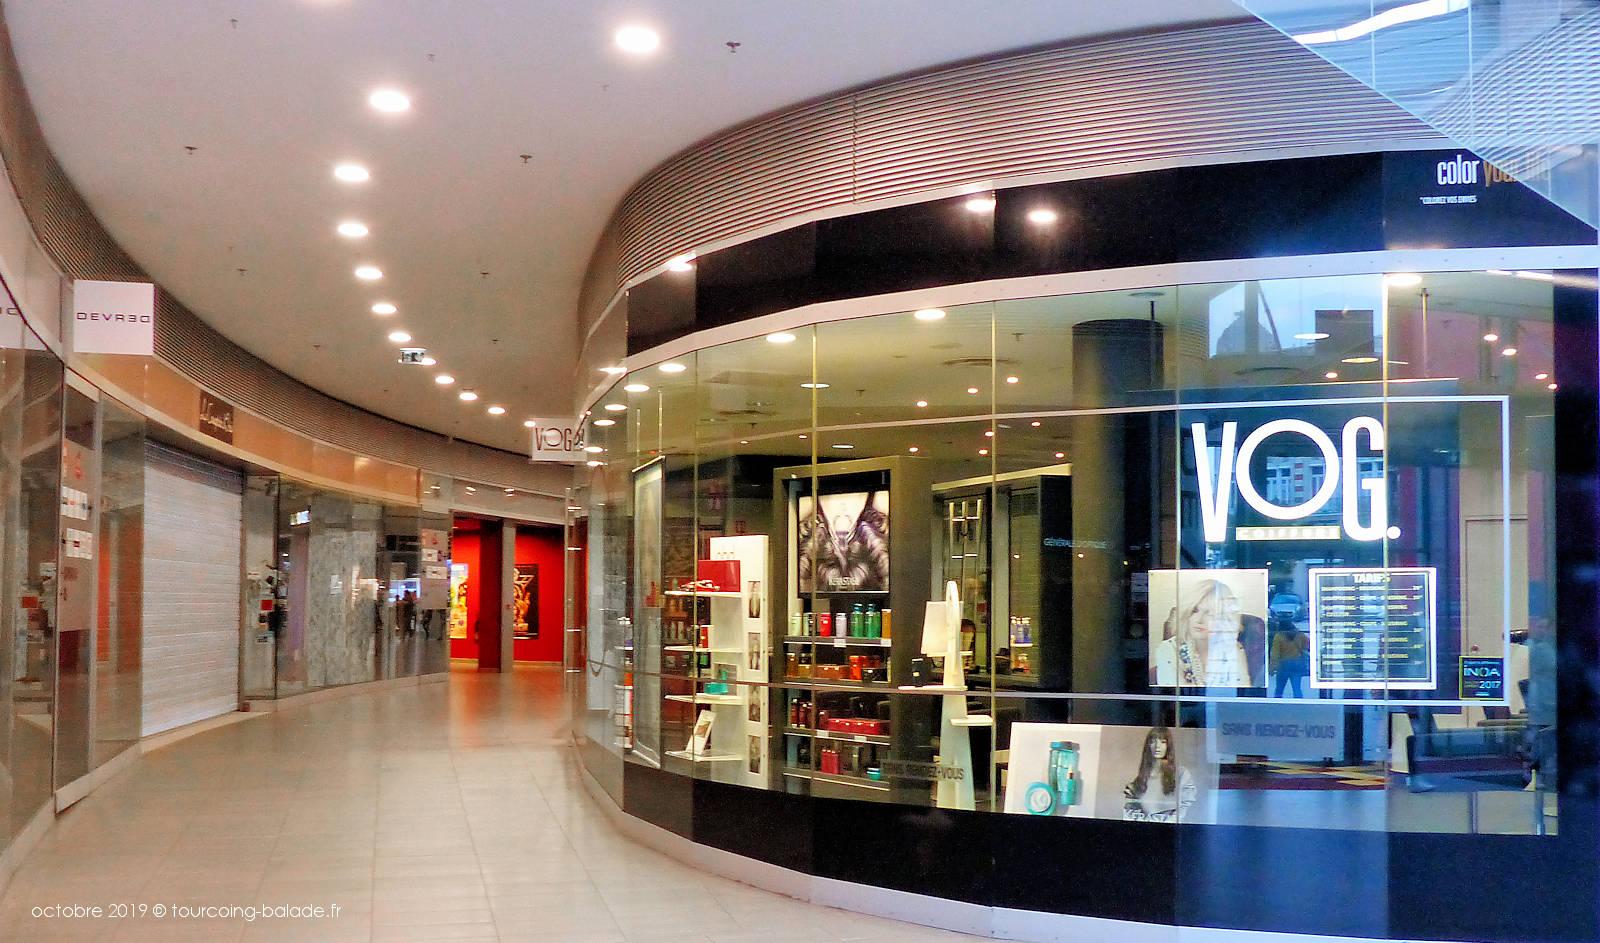 VOG Coiffure - Tourcoing Centre